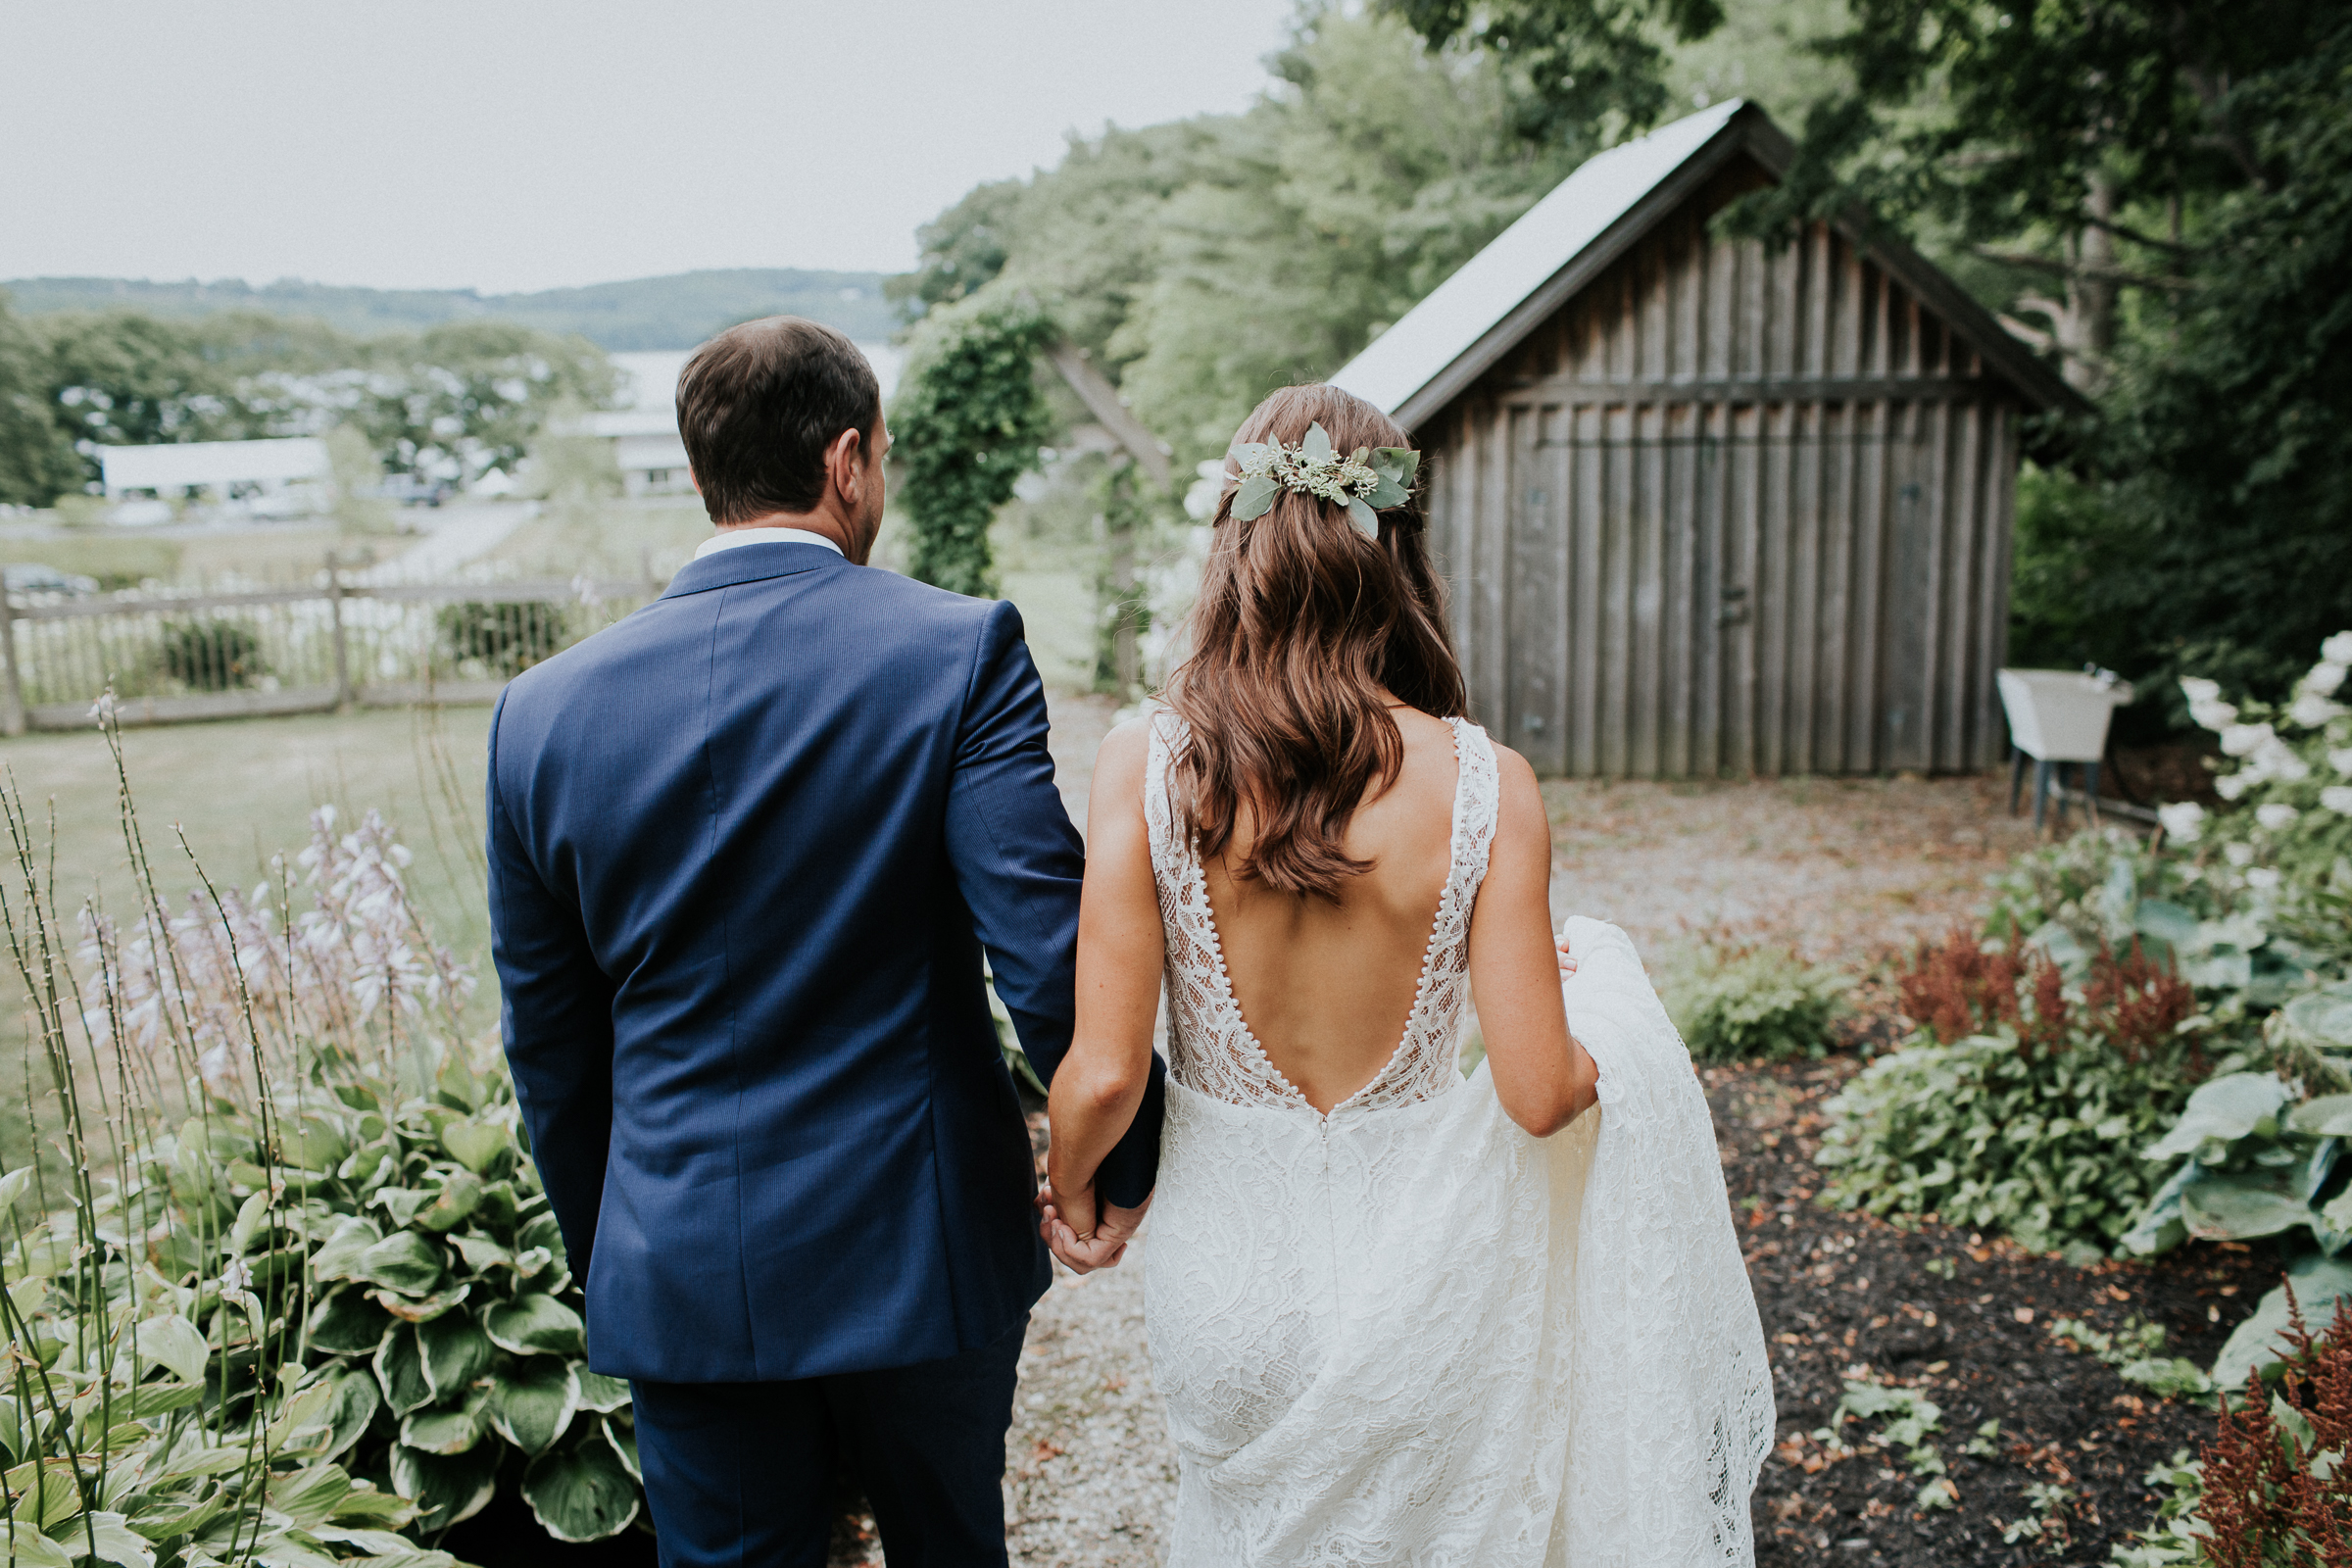 Marianmade-Farm-Wiscasset-Maine-Fine-Art-Documentary-Wedding-Photographer-Elvira-Kalviste-Photography-38.jpg